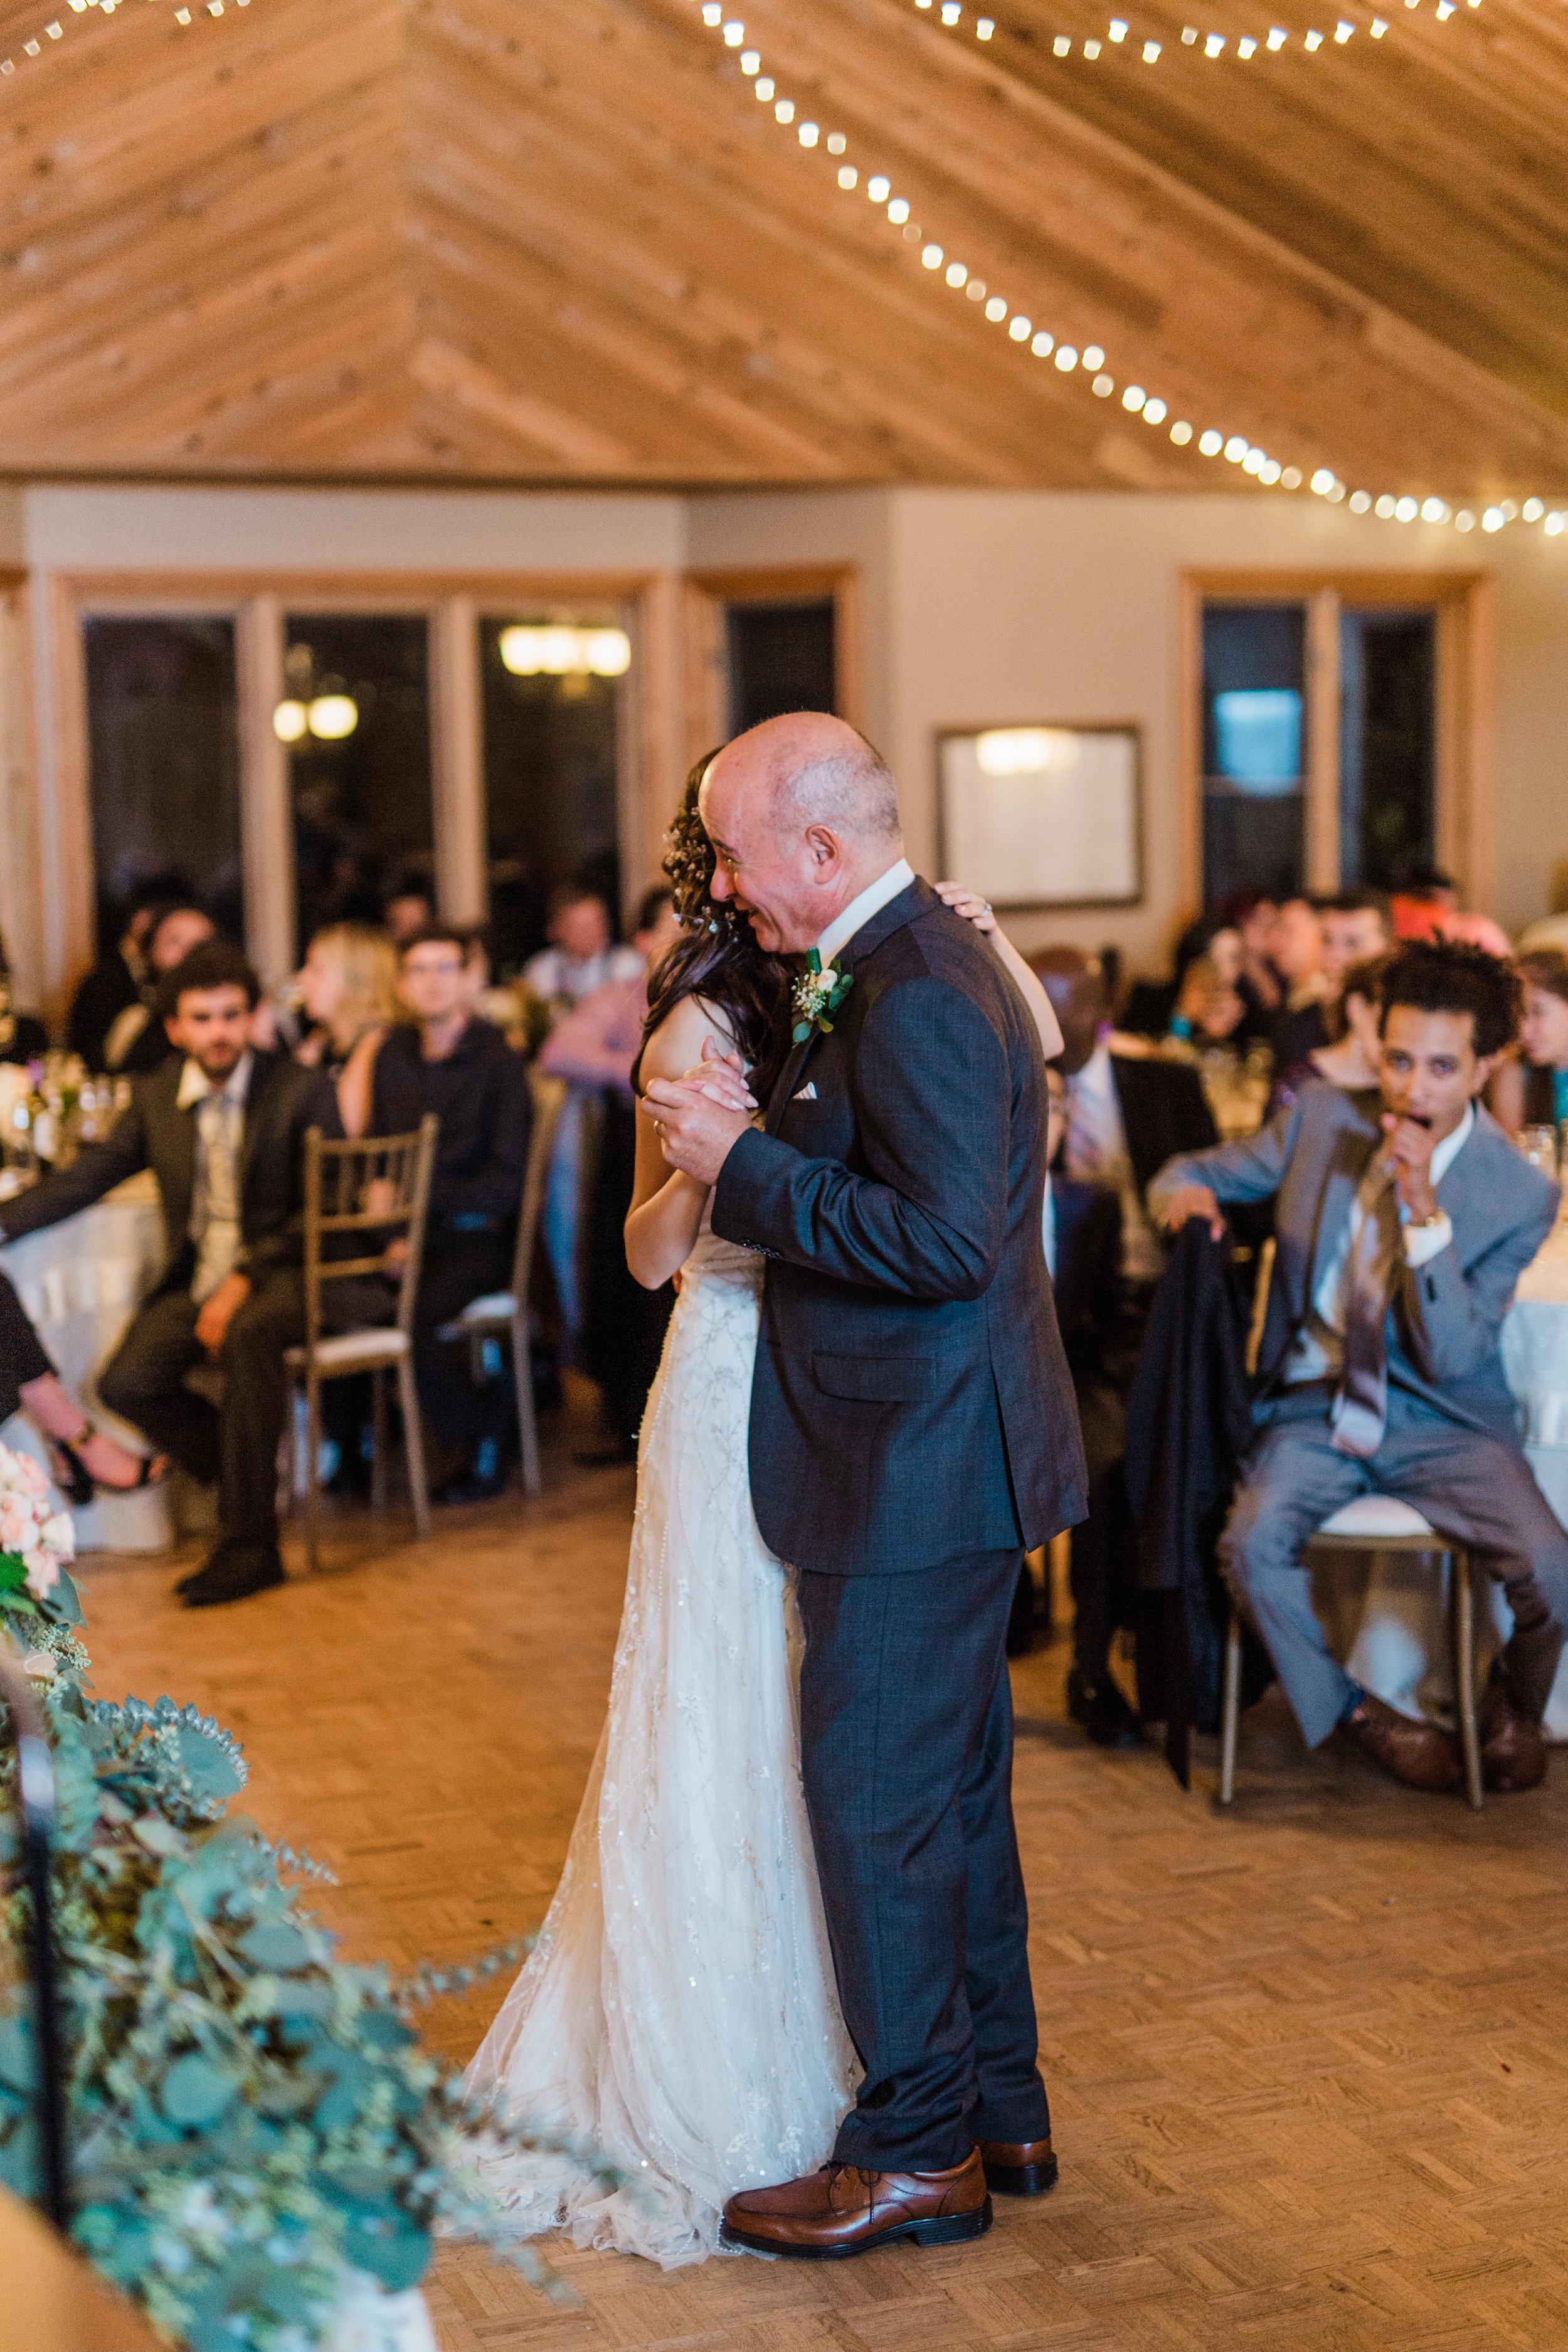 Amir-Golbazi-Danielle-Giroux-Photography_Toronto-Wedding_Cedarwood_Rachel-Paul_737.jpg